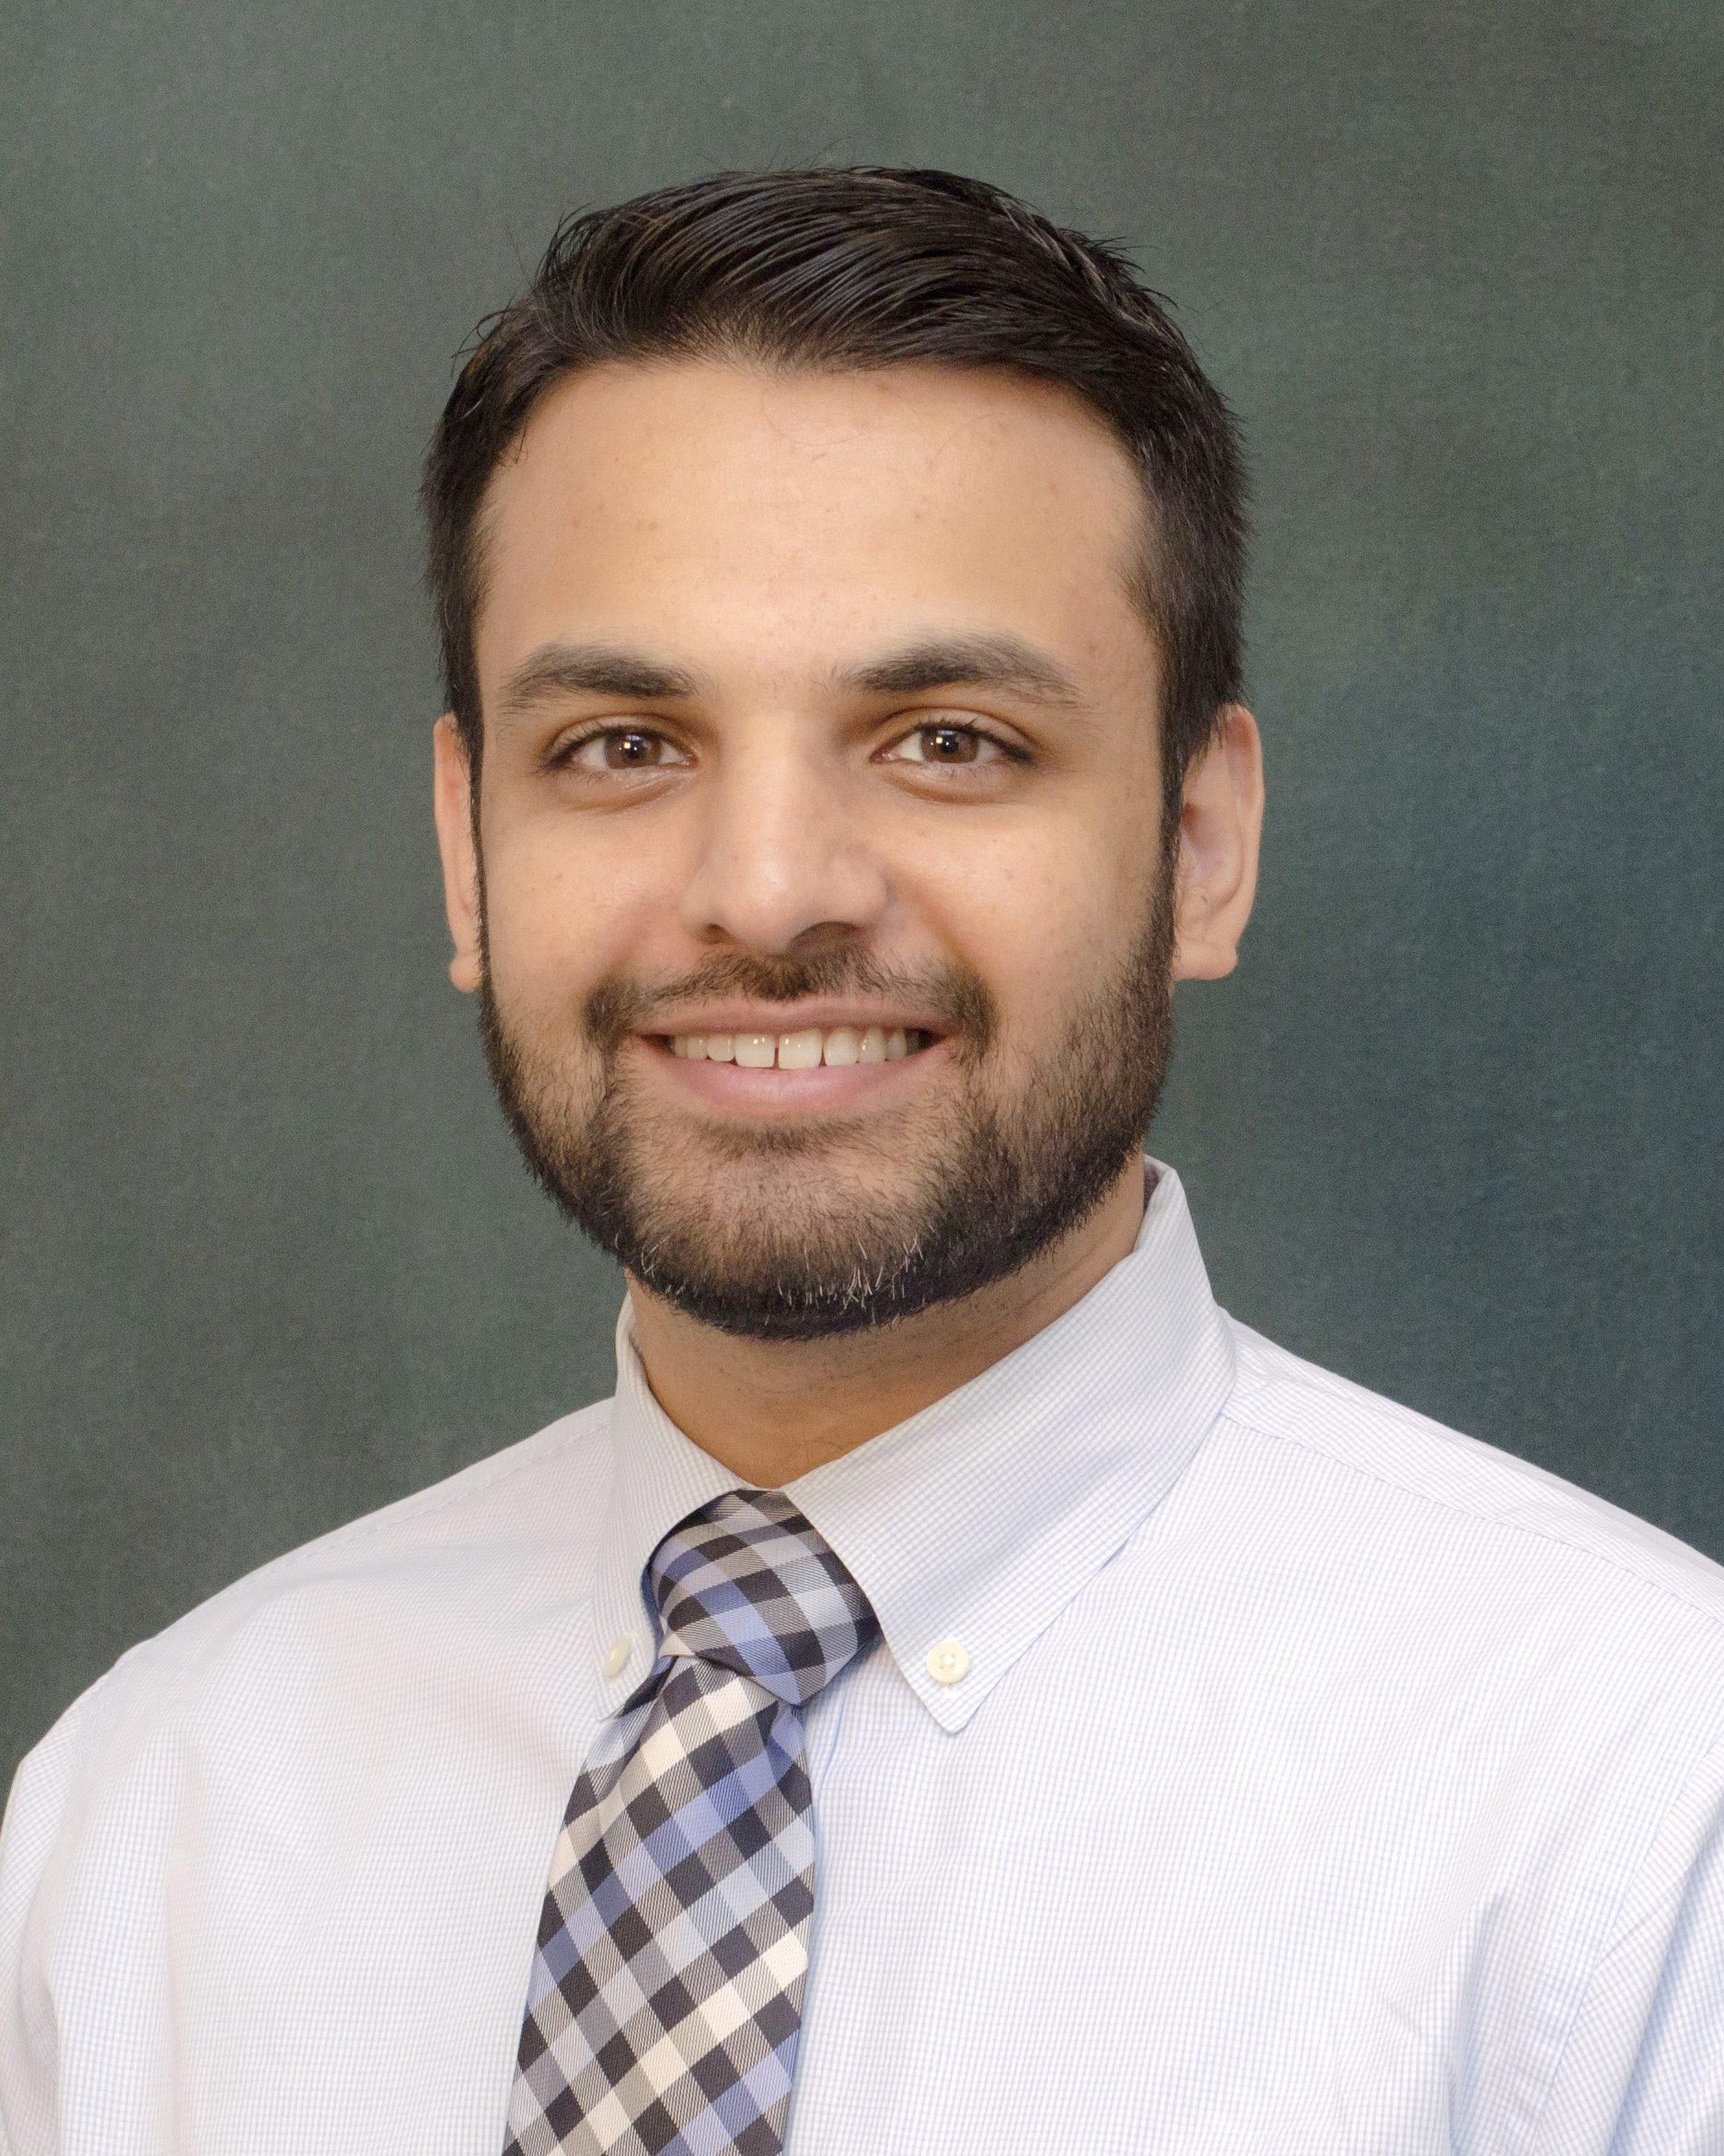 Raheel John, DO - A Contracted Provider of Memorial Healthcare